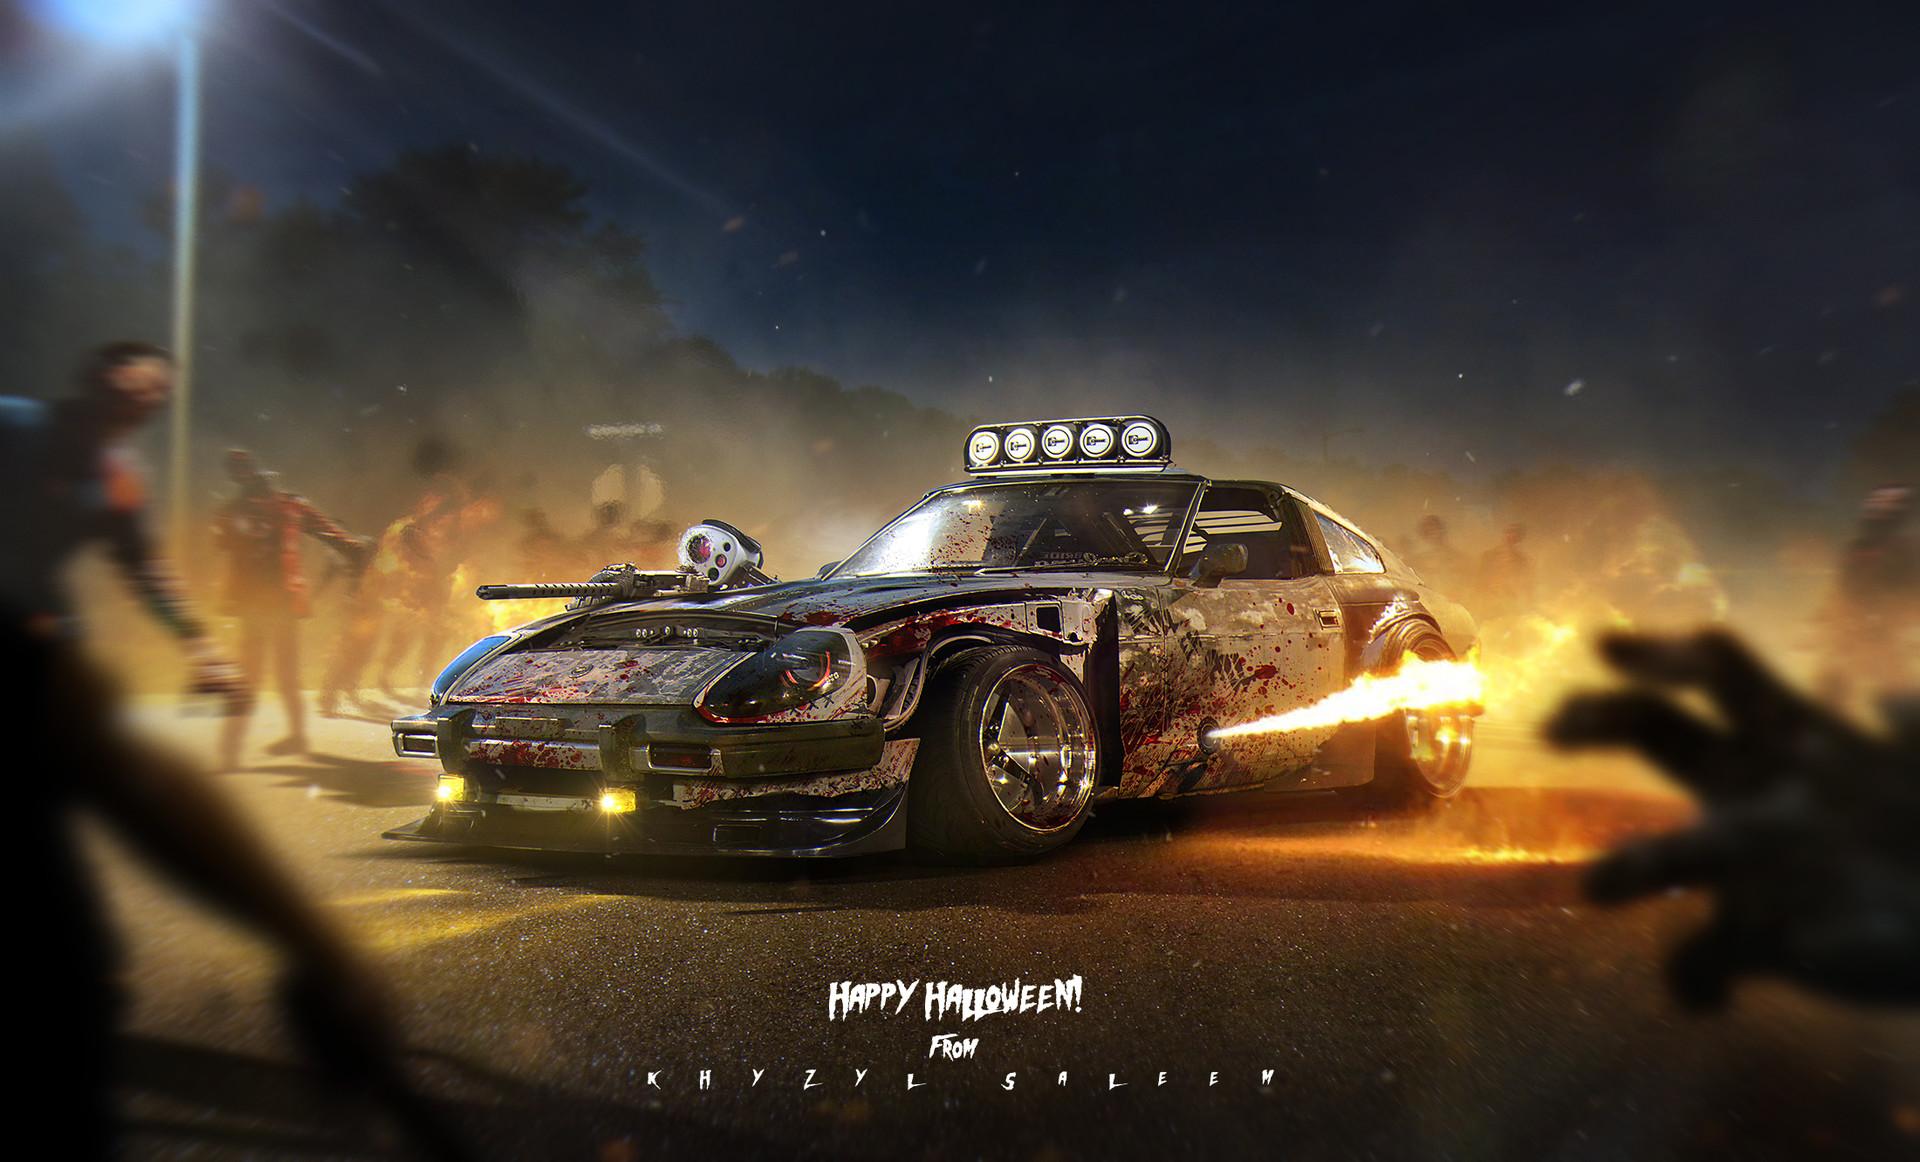 Need For Speed Girl Wallpaper Artstation Z Halloween Khyzyl Saleem